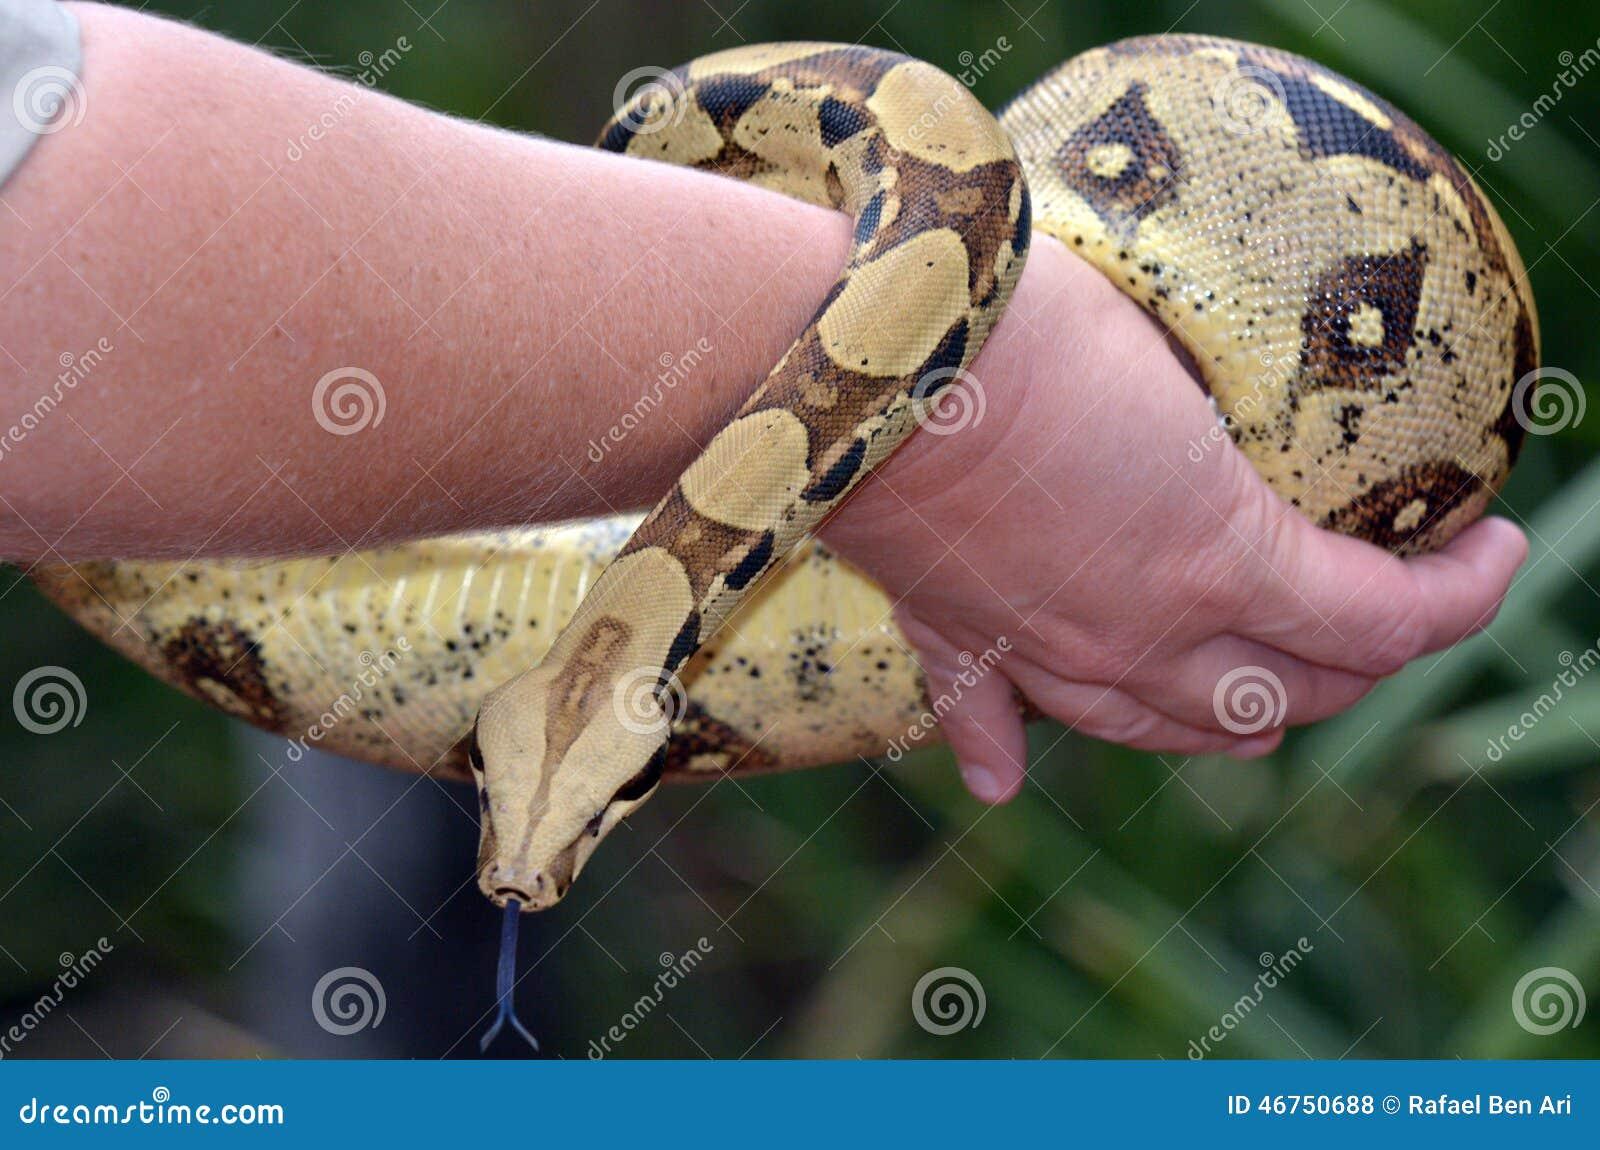 Python current date in Australia